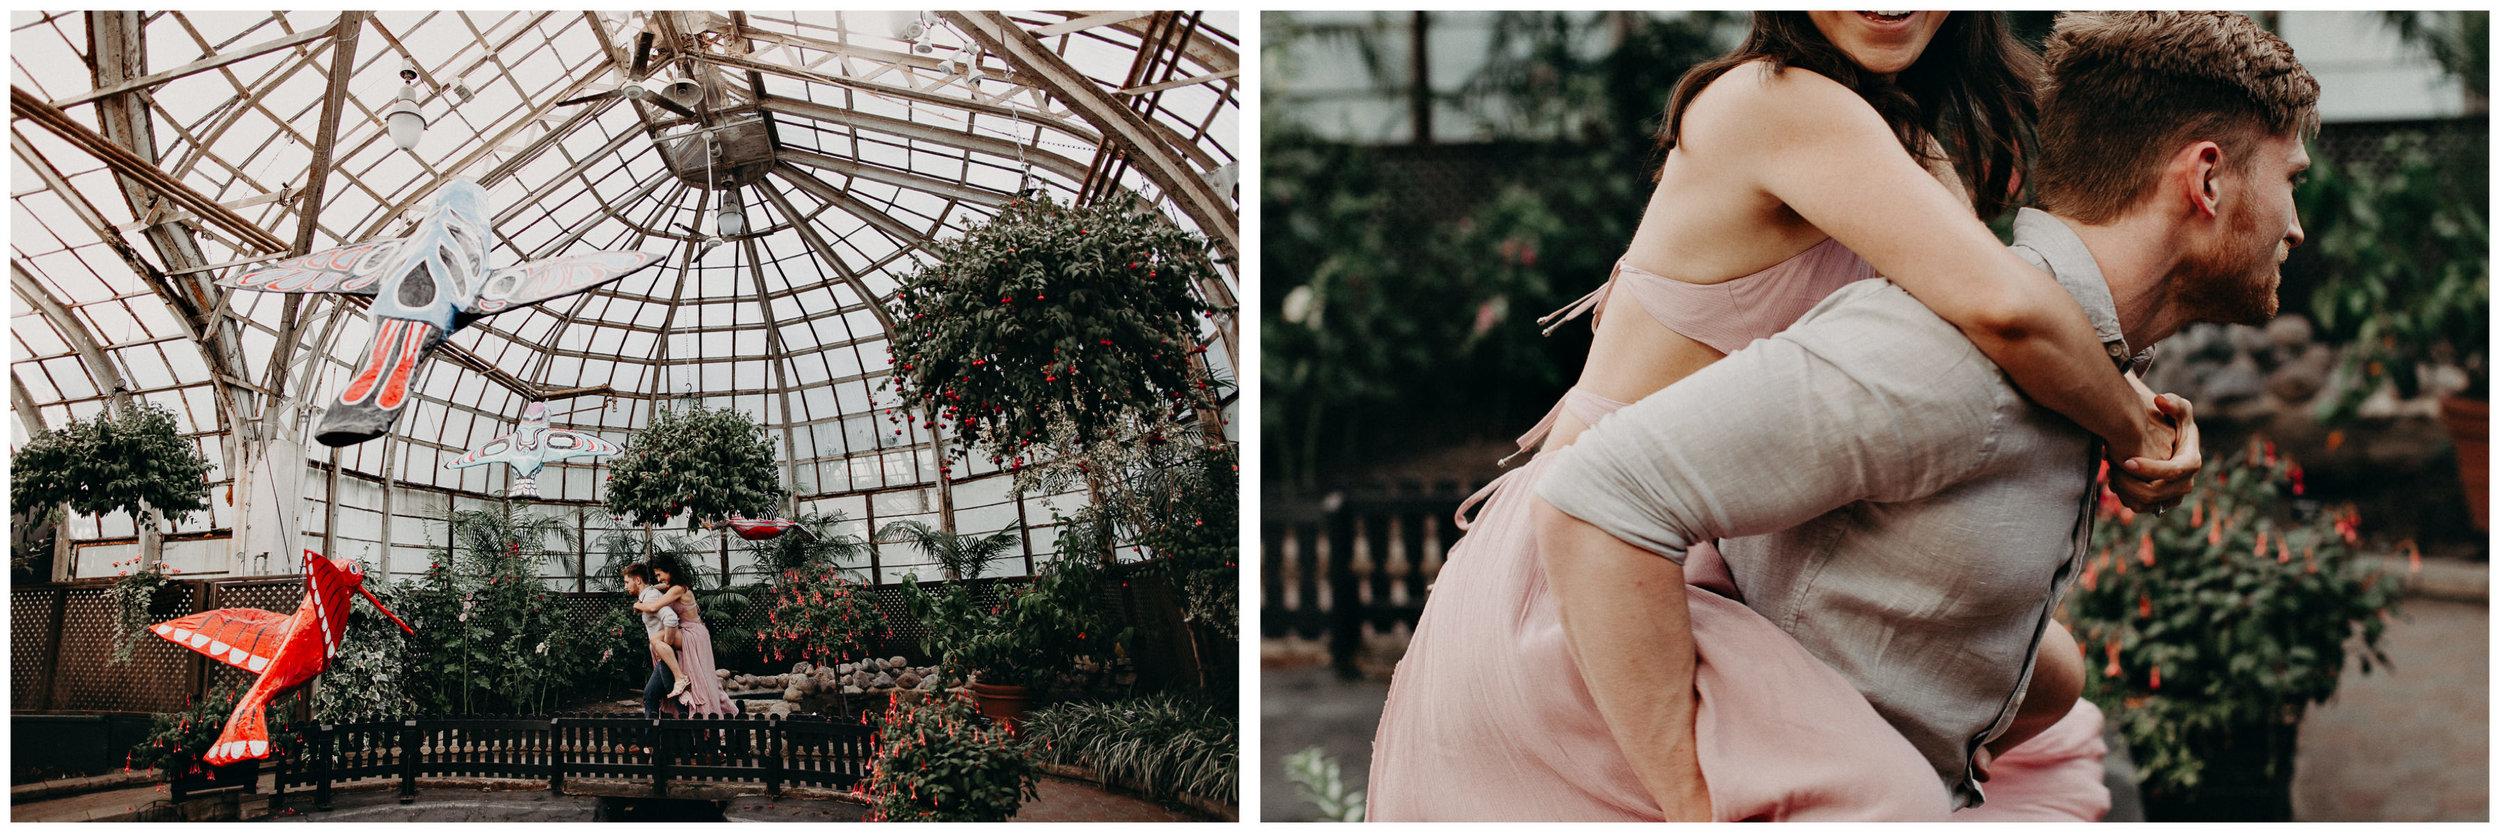 24- Chicago engagement wedding photographer - Aline Marin Photography.jpg